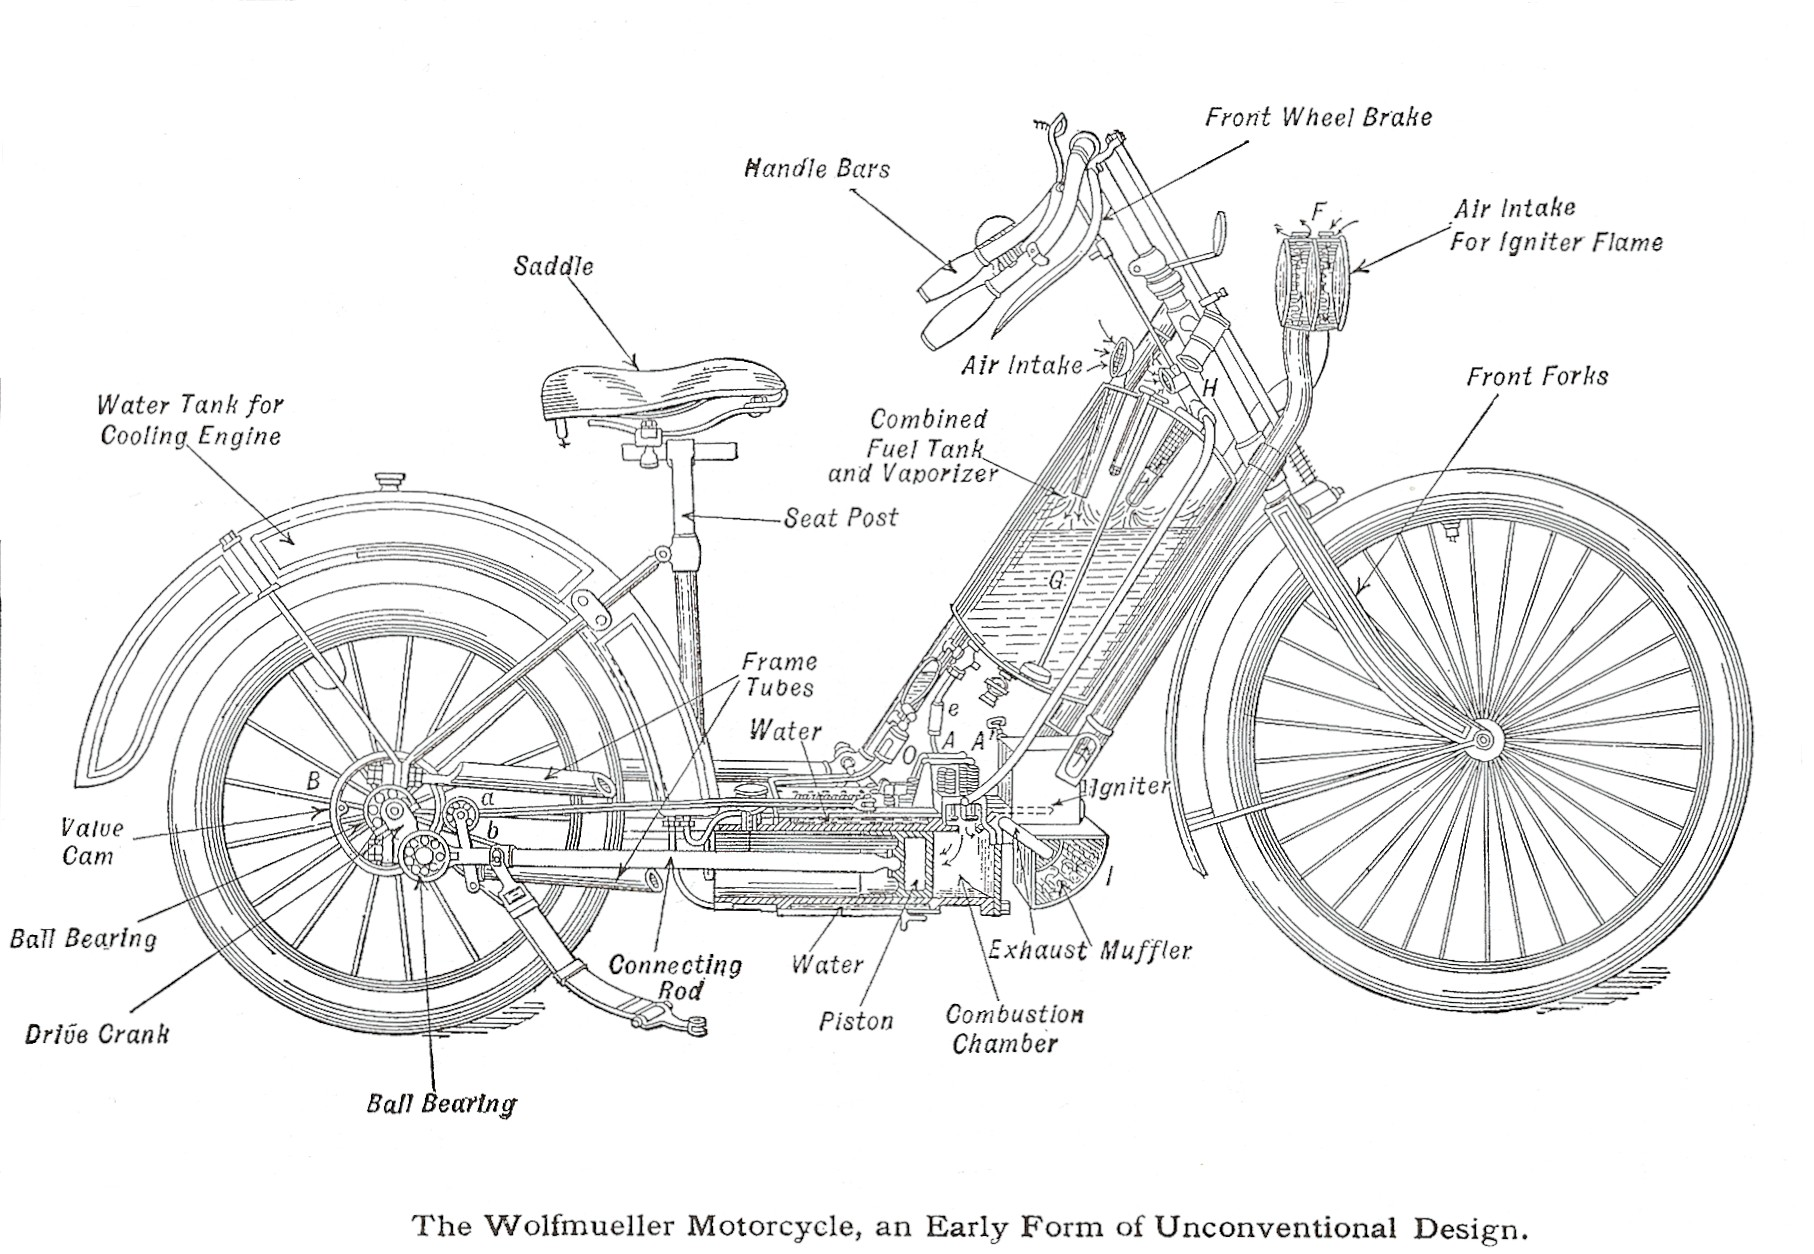 Basic Diagram Of Car Parts File 1894 Hildebrand & Wolfmüller Diagram Wikimedia Mons Of Basic Diagram Of Car Parts